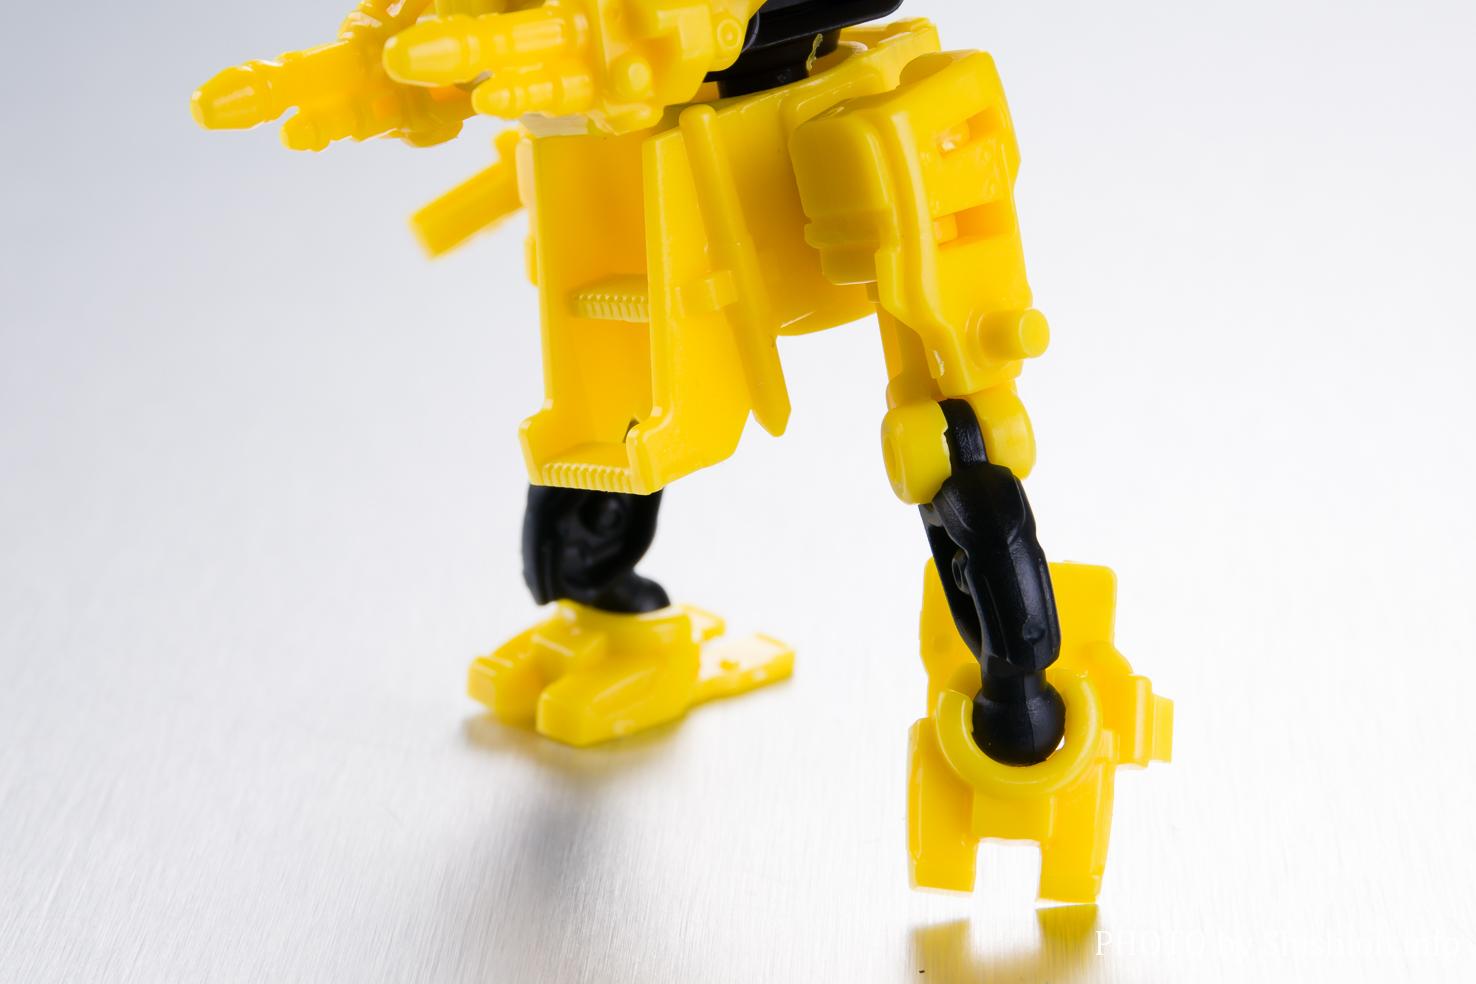 POCKETTITANS ROBOT RC